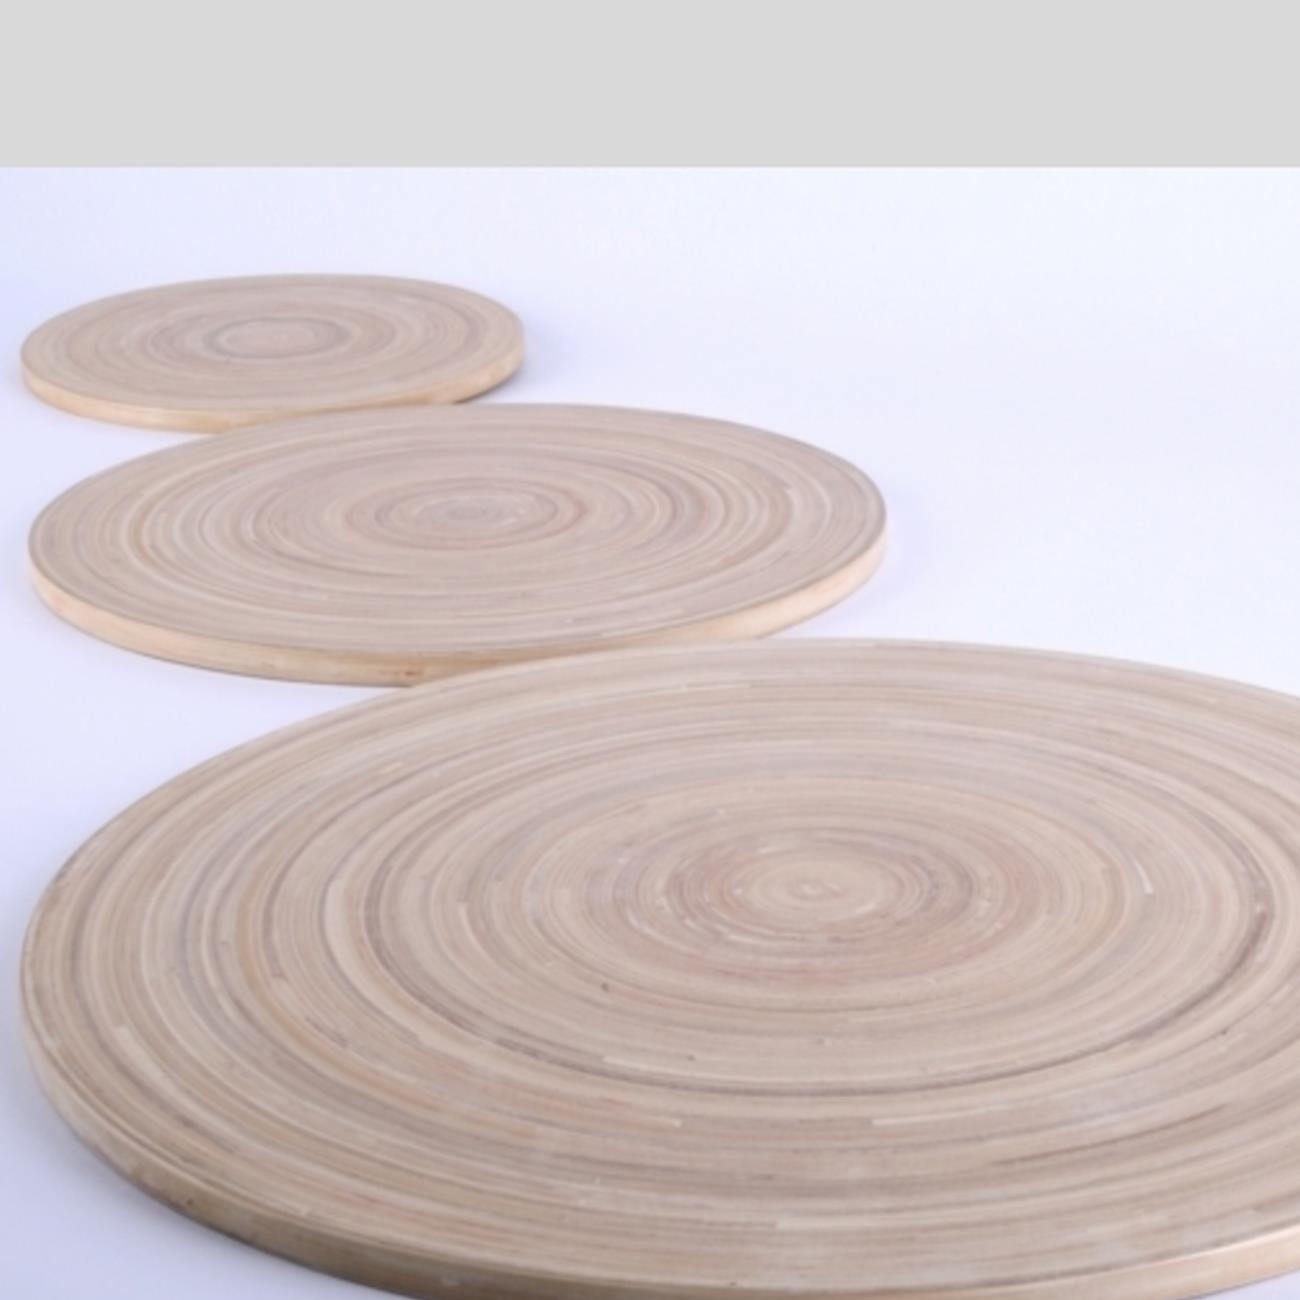 Bambus Natur Holzplatte Flach Im Deko Shop